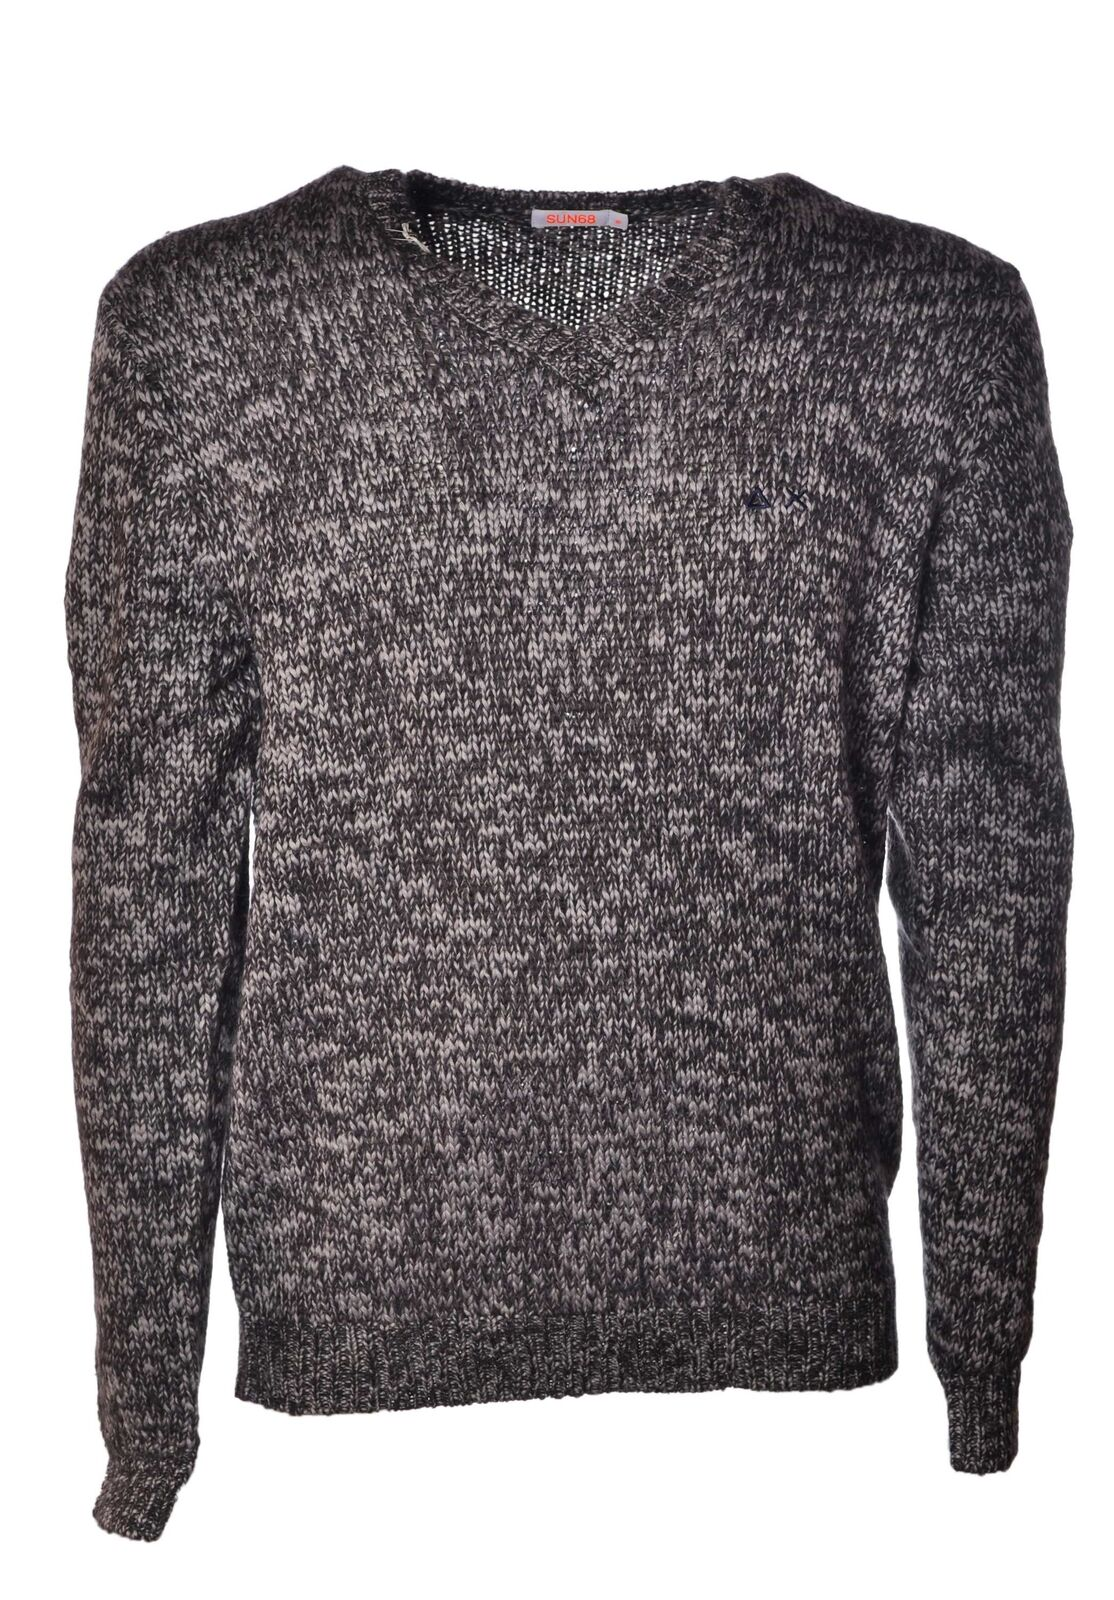 Sun 68 - Knitwear-Sweaters - Man - Grau - 4048018B183513